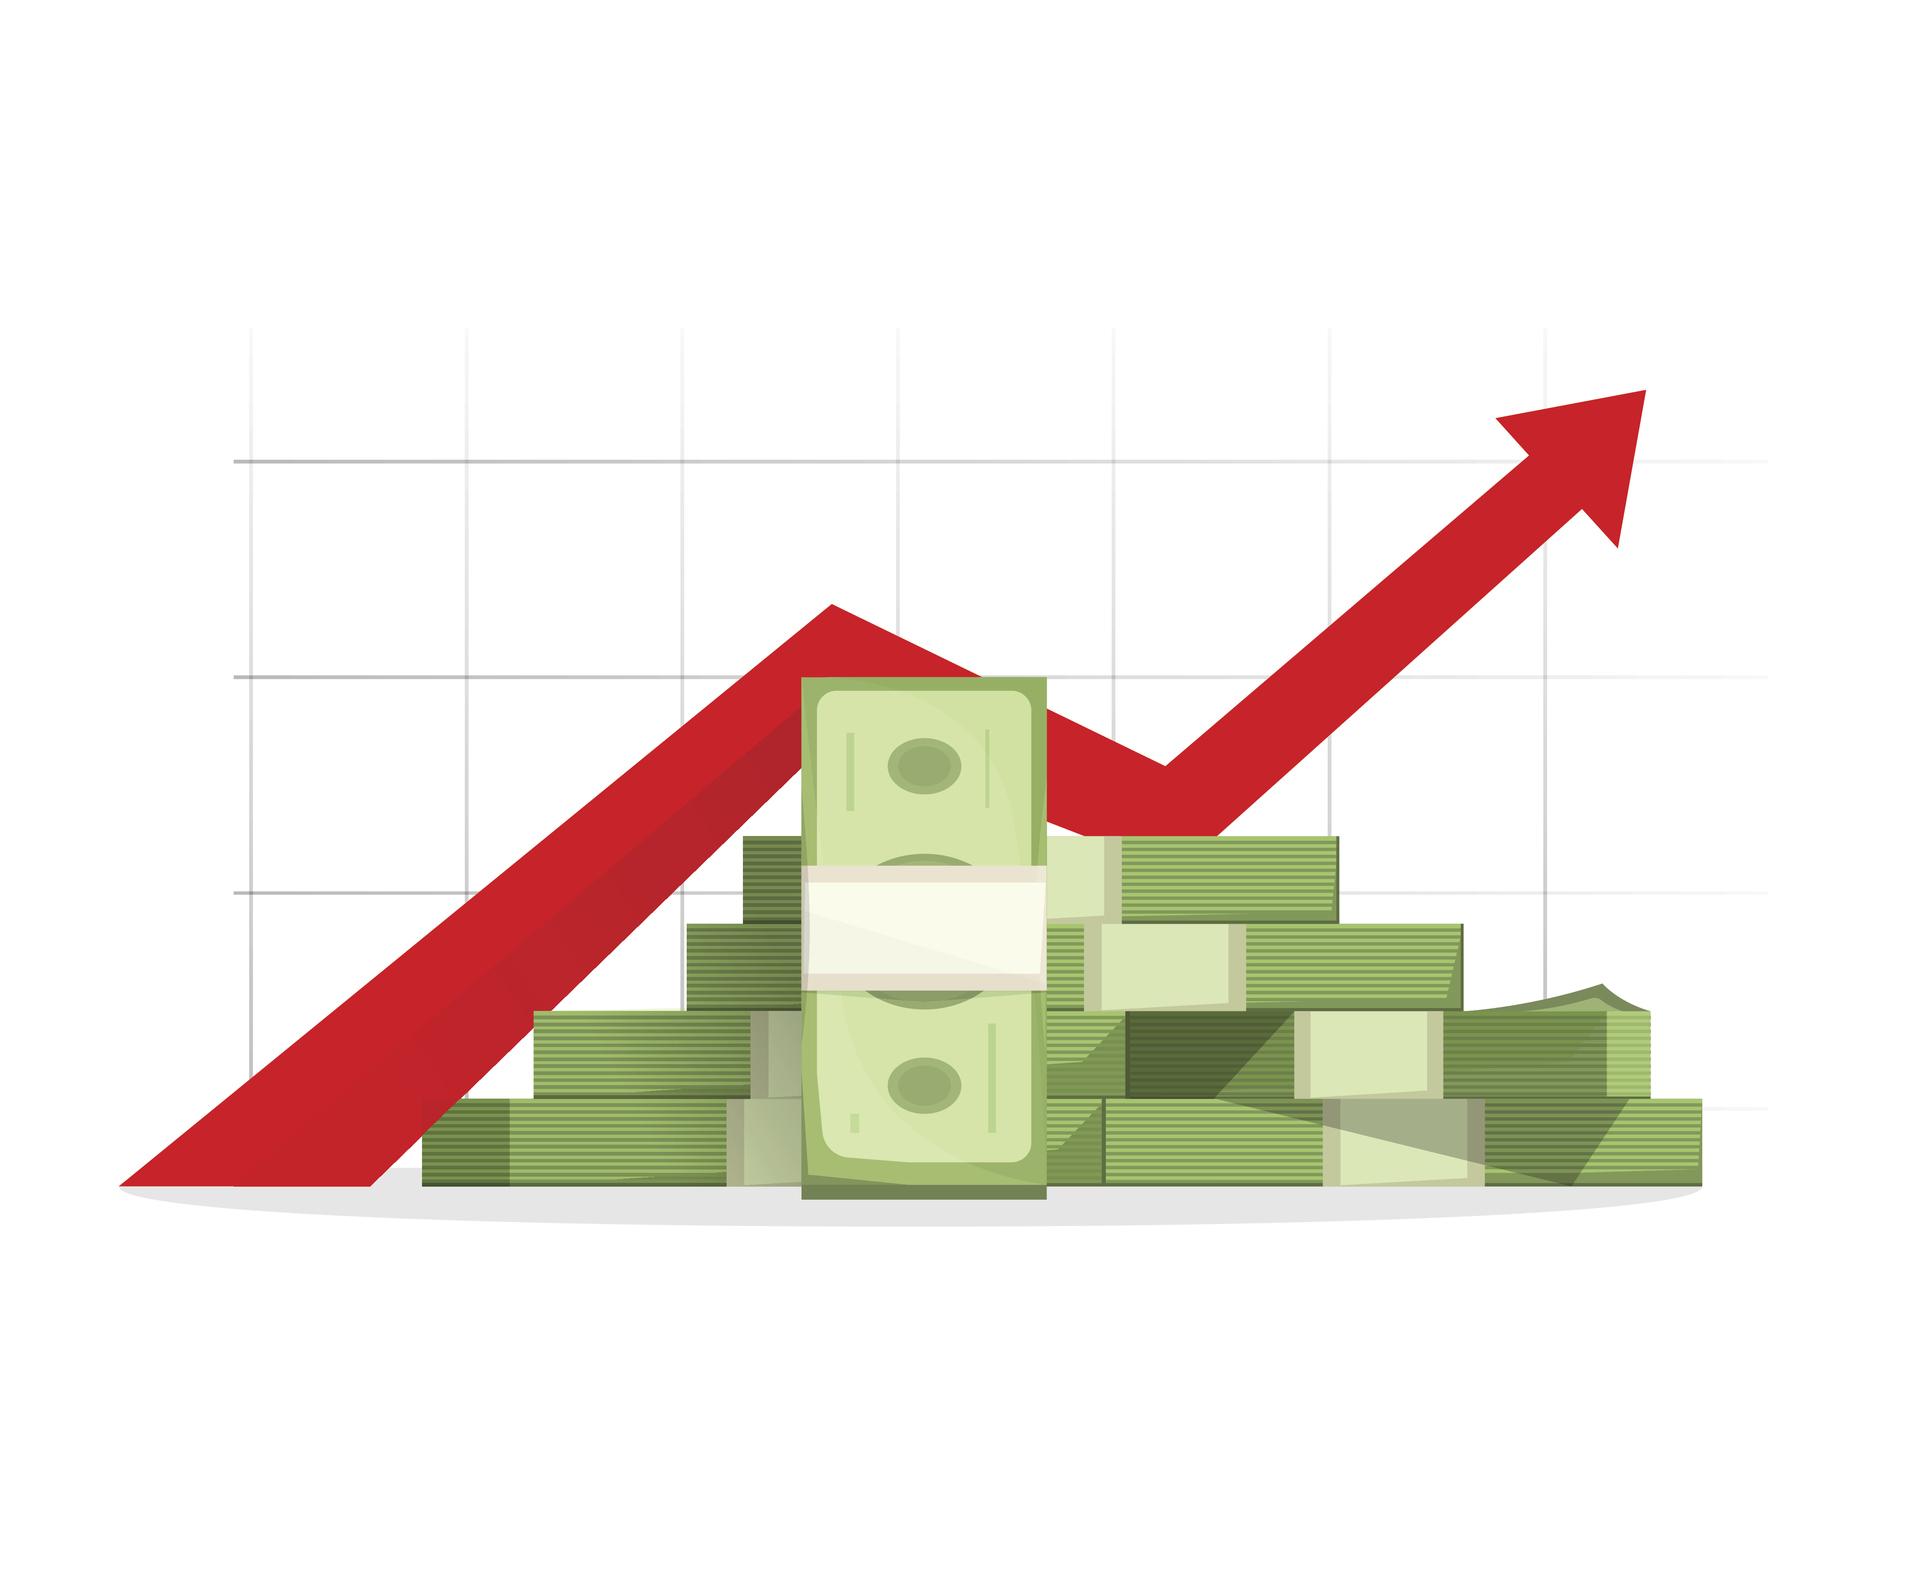 A chart arrow over a pile of cash